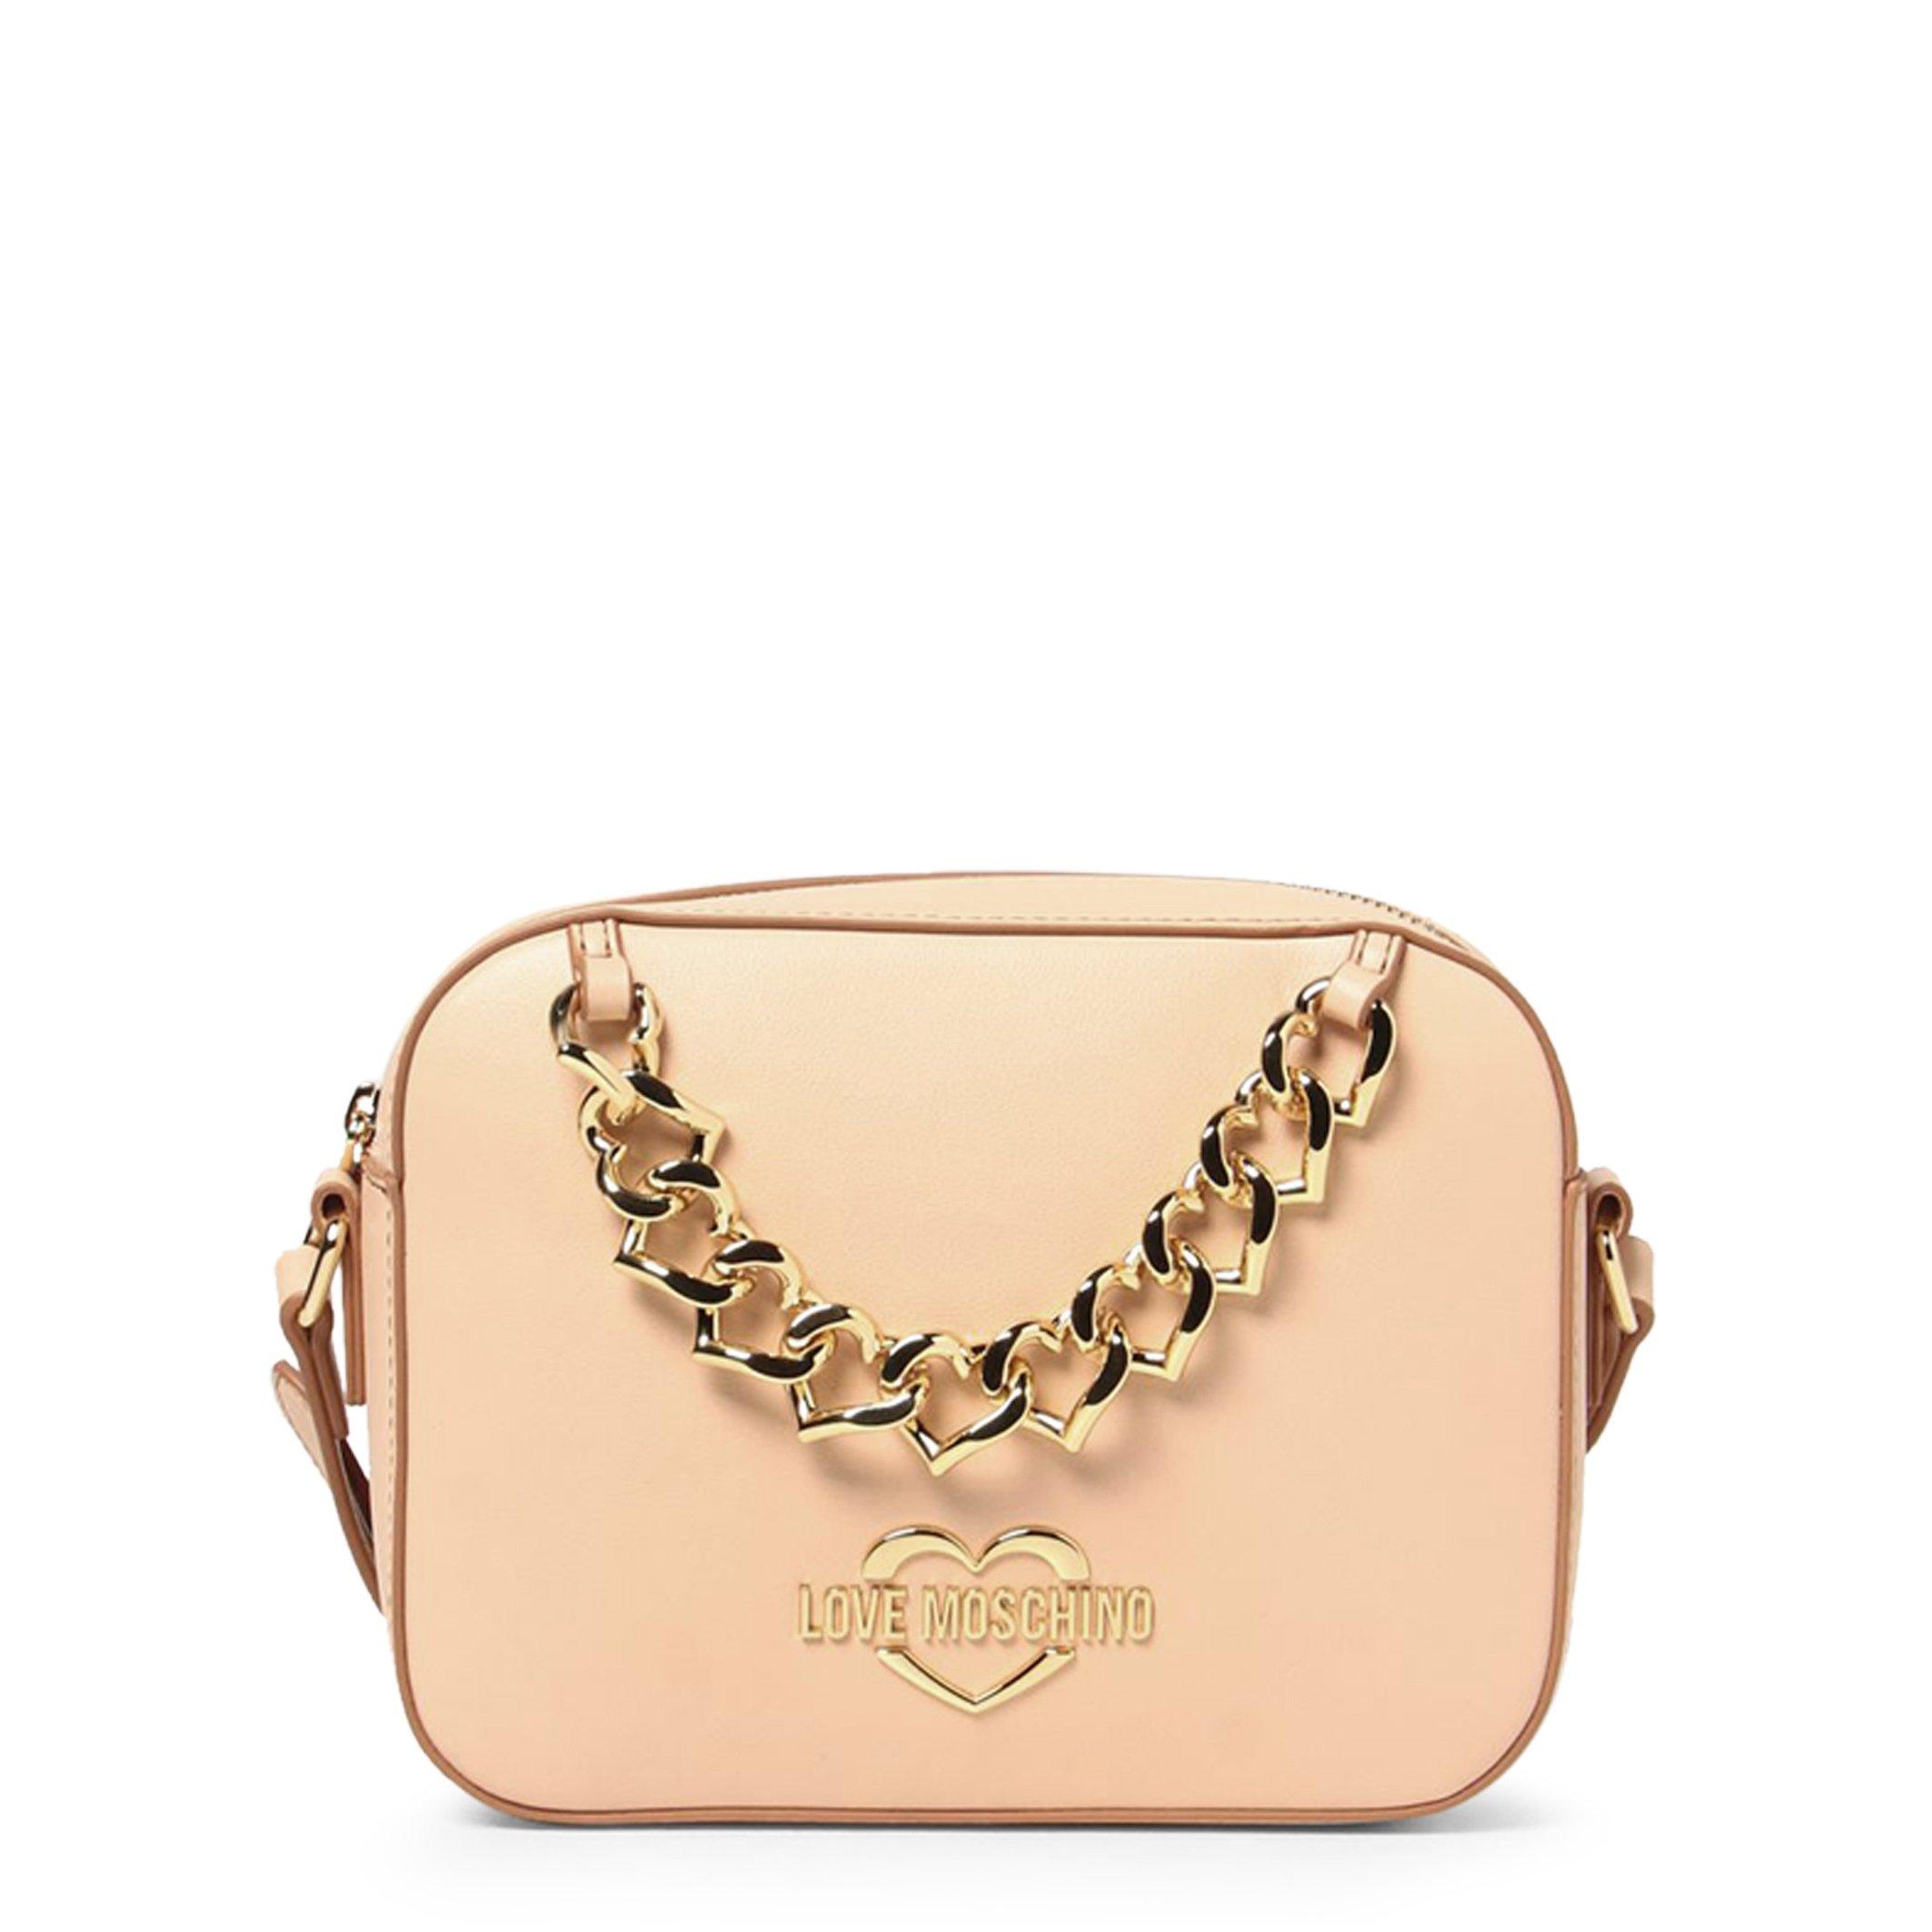 Love Moschino Women's Crossbody Bag Various Colours JC4195PP1DLK0 - brown NOSIZE